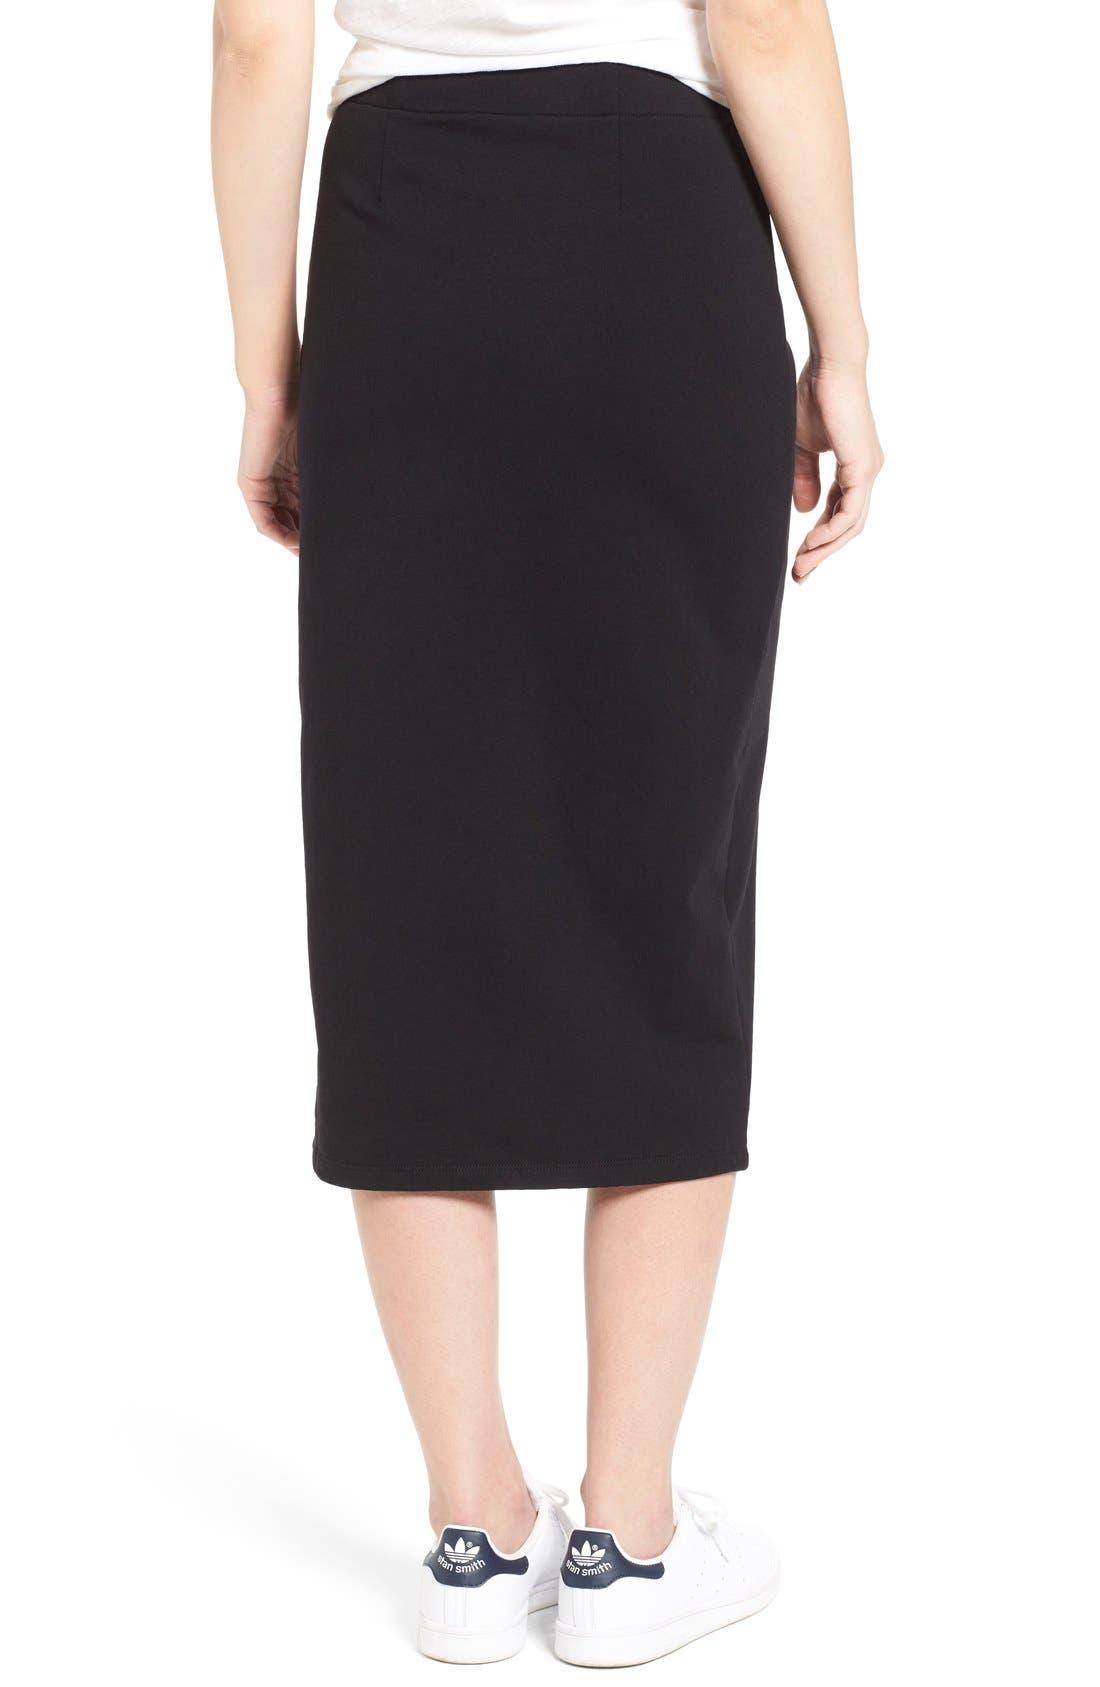 Alternate Image 2  - James Perse Stretch Fleece Pencil Skirt